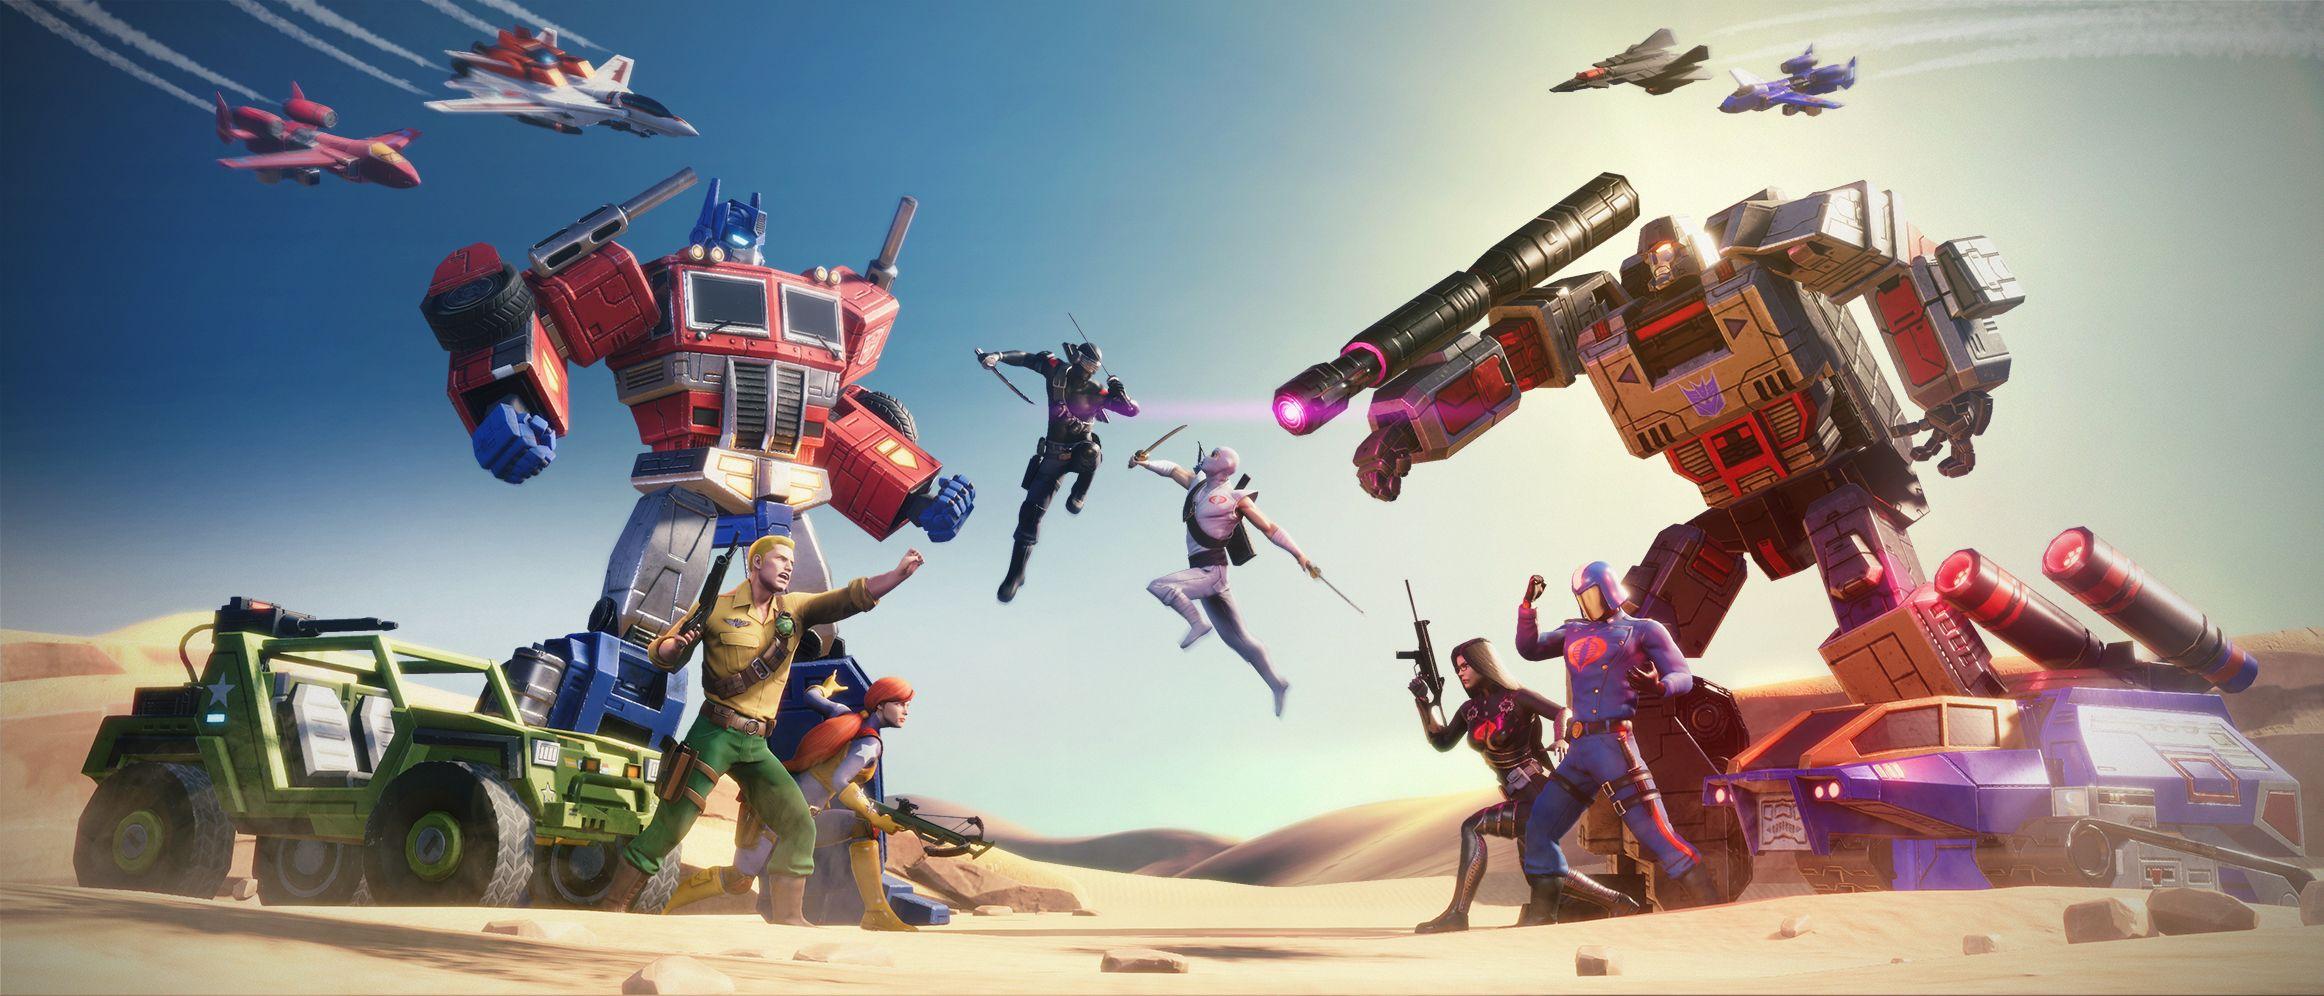 Earth Wars: GI Joe and Cobra Battle the Transformers in New Trailer